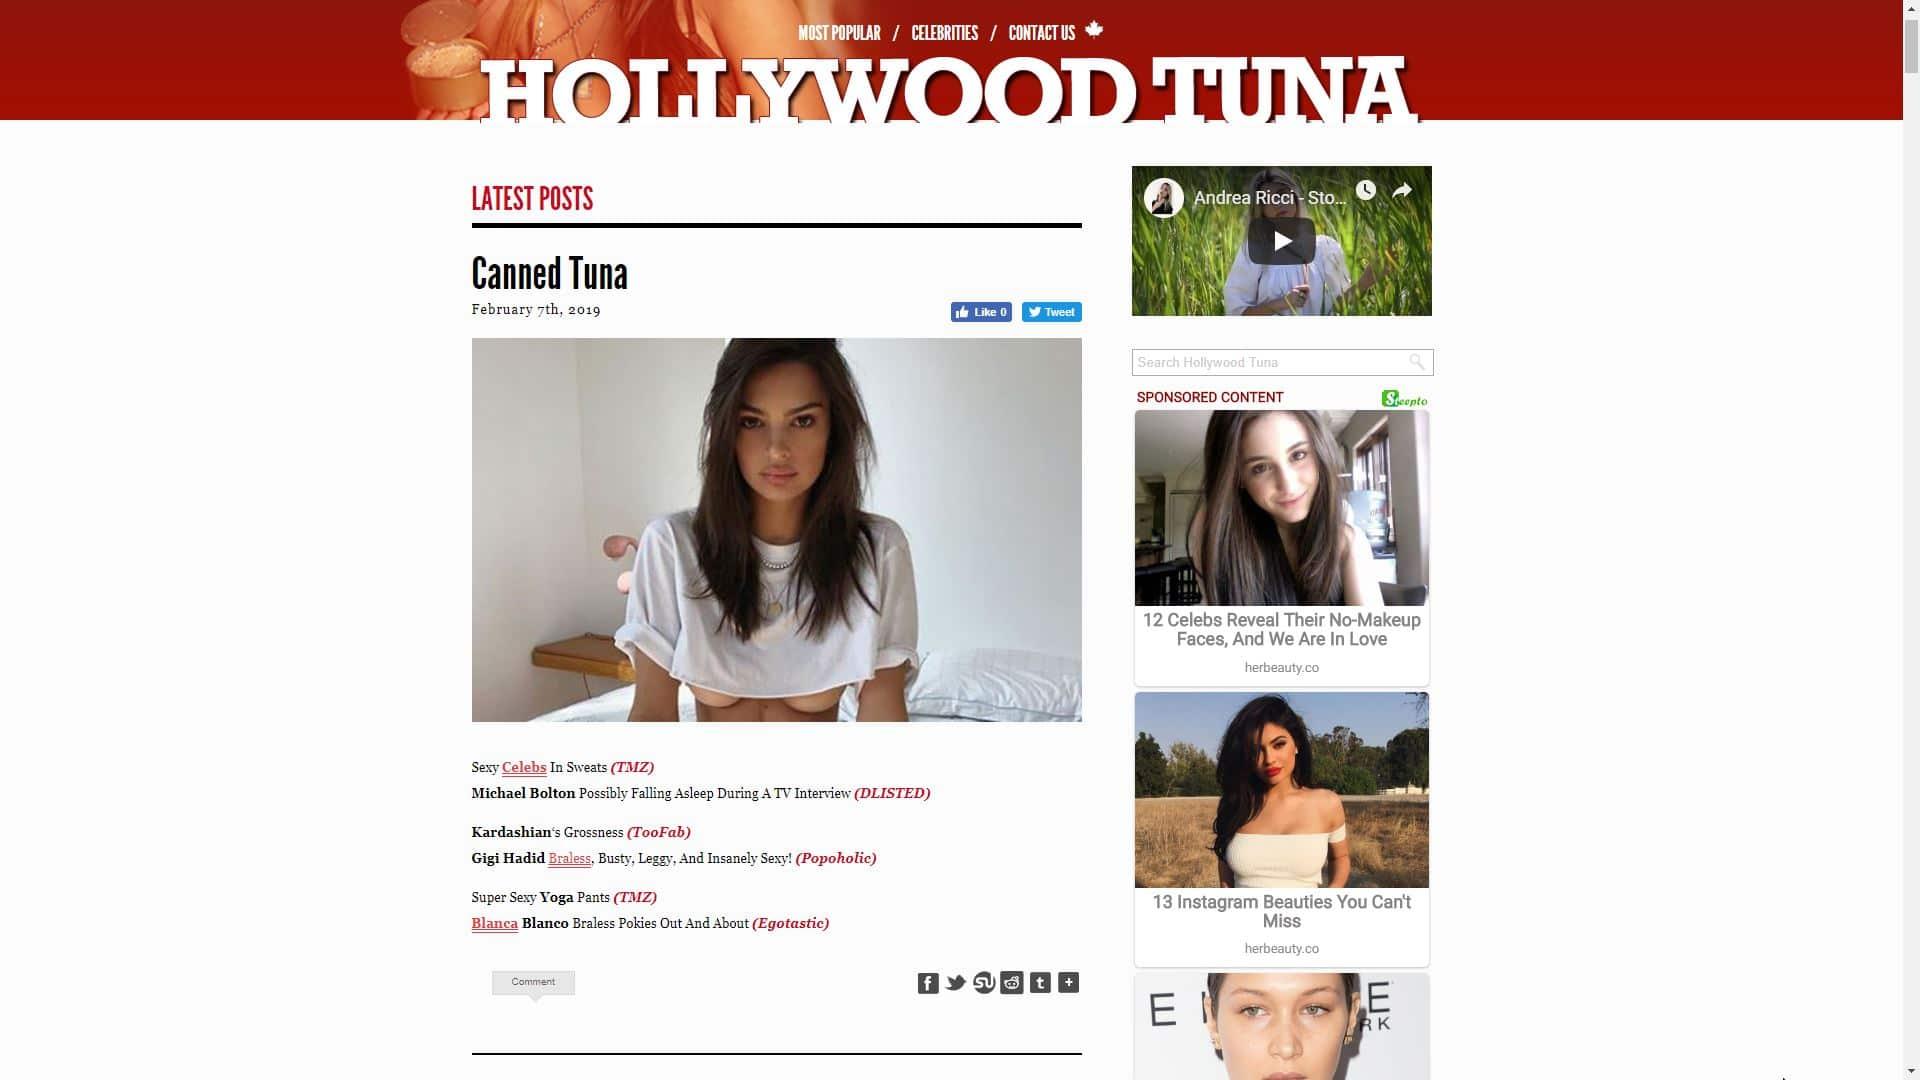 Hollywood Tuna Main Page